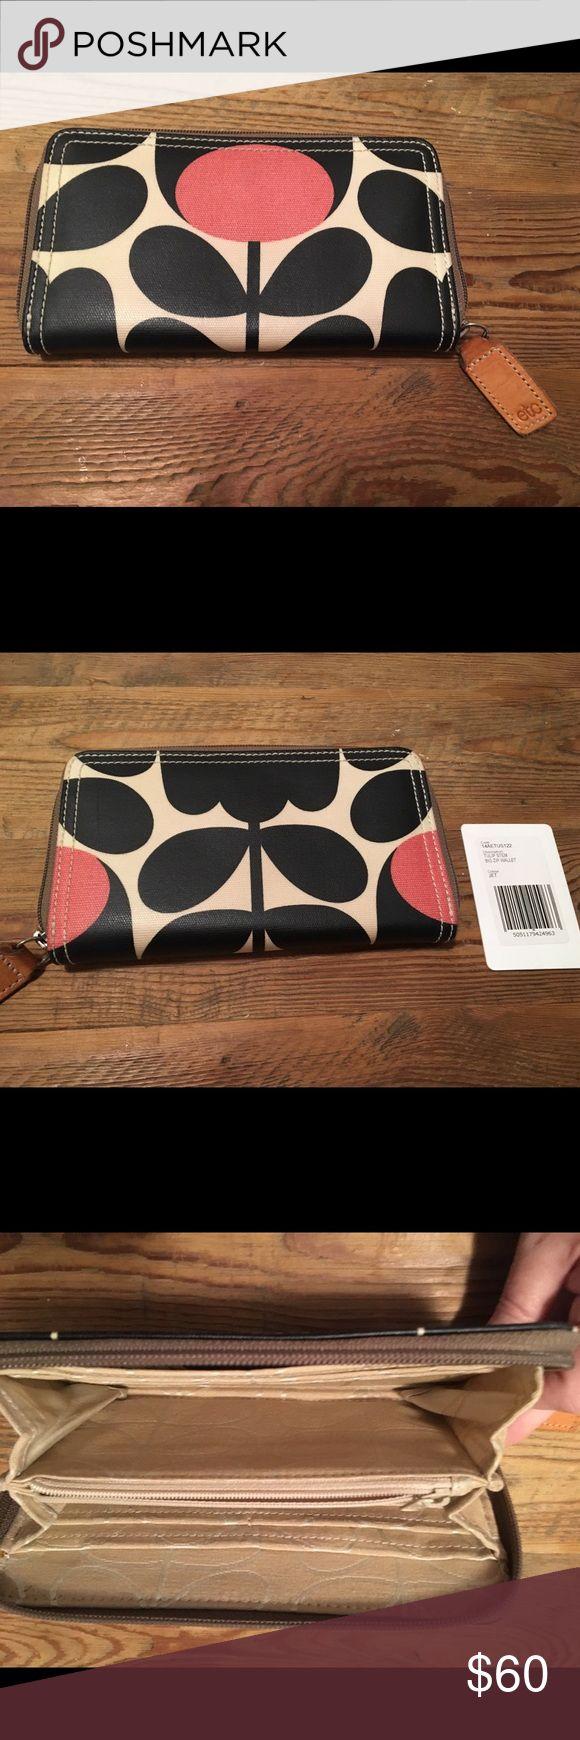 Orla Kiely Wallet Excellent condition  Orla Kiely Zip around wallet Orla Kiely Bags Wallets